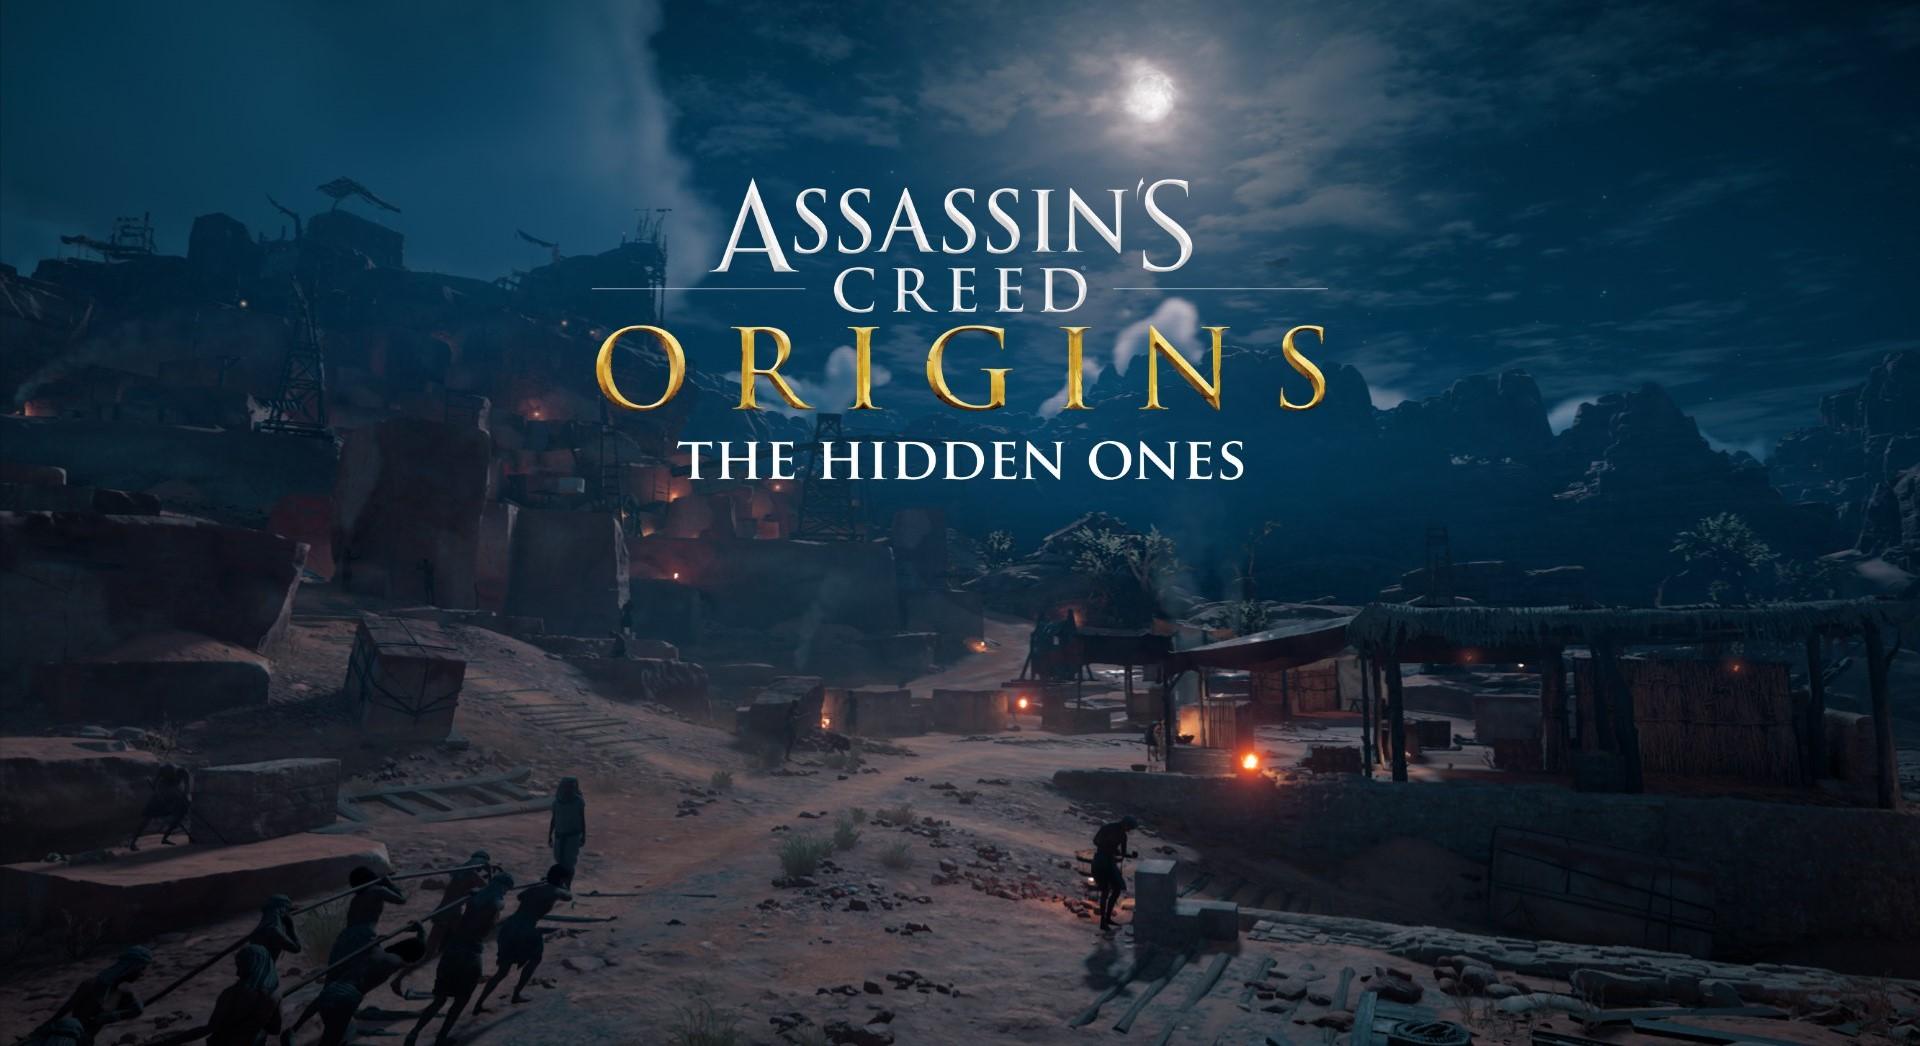 Assassin S Creed Origins The Hidden Ones Pc Review Gamewatcher